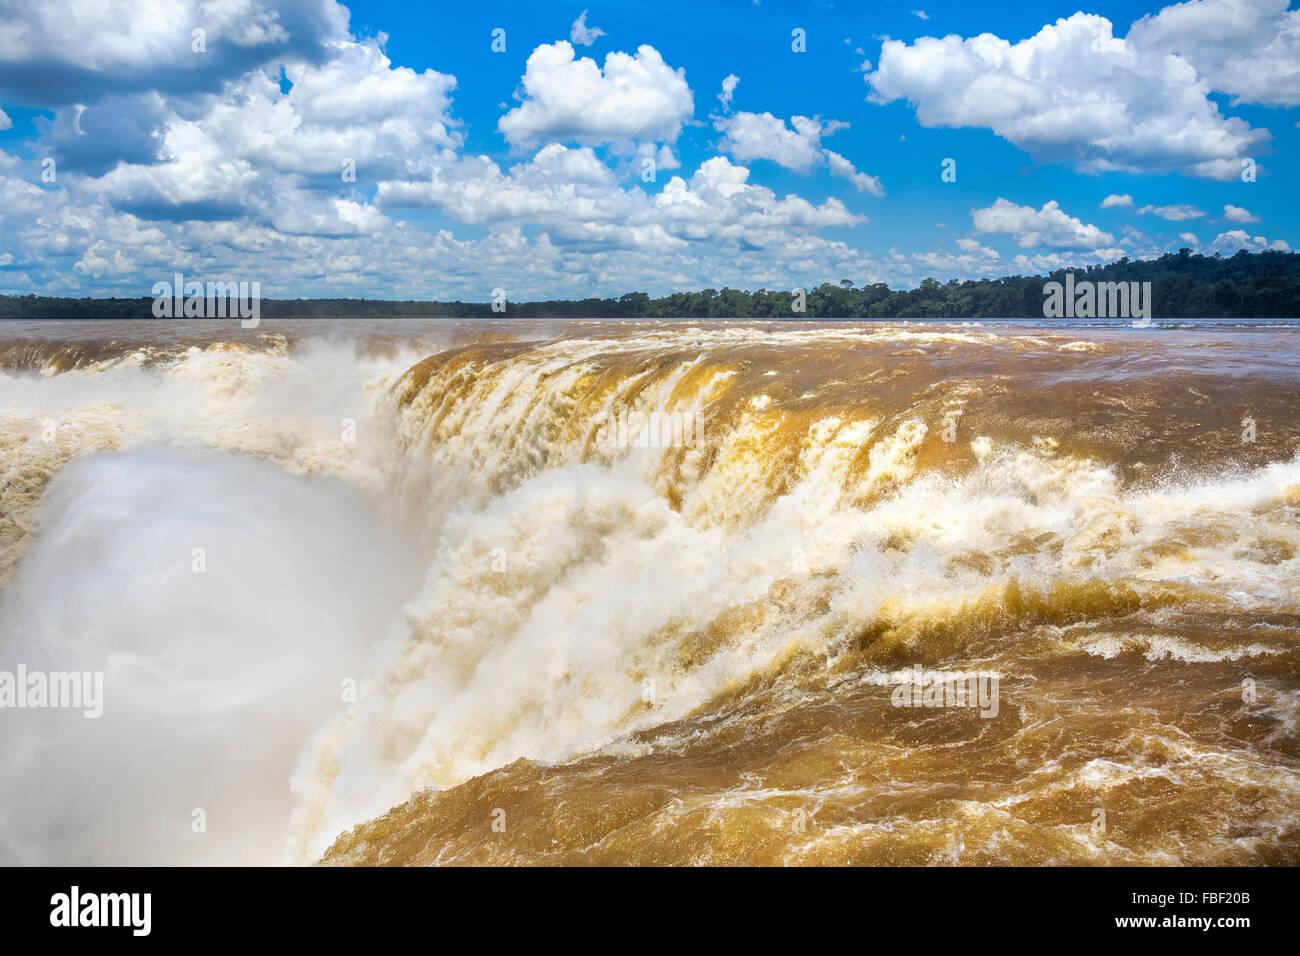 Devil's Throat at Iguazu Falls, on the border of Argentina and Brazil. - Stock Image